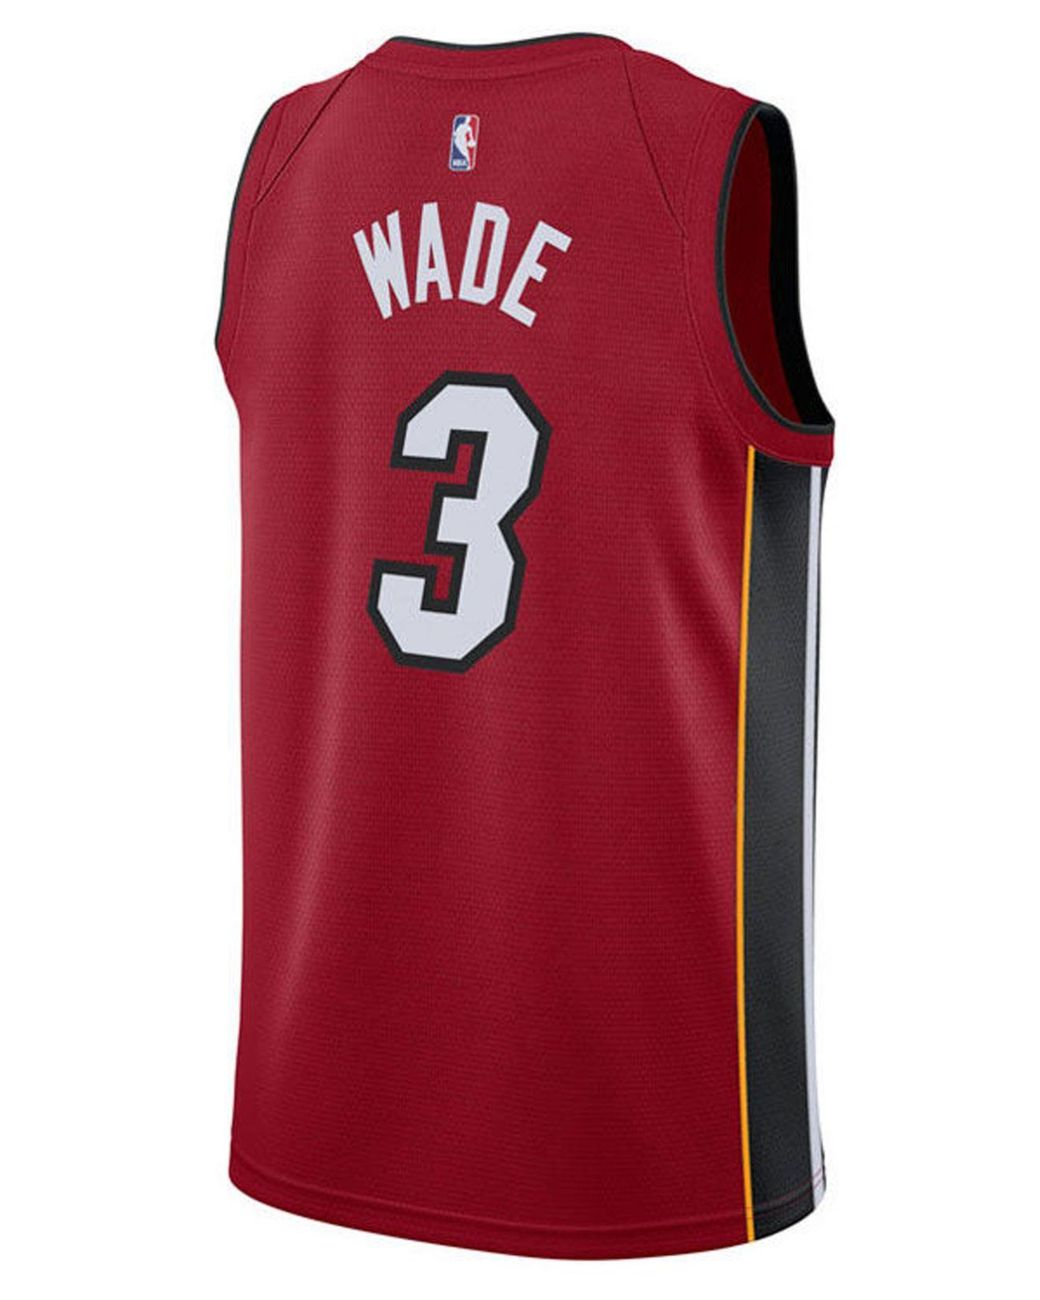 sale retailer c90a4 49201 Red Dwyane Wade Miami Heat Statement Swingman Jersey